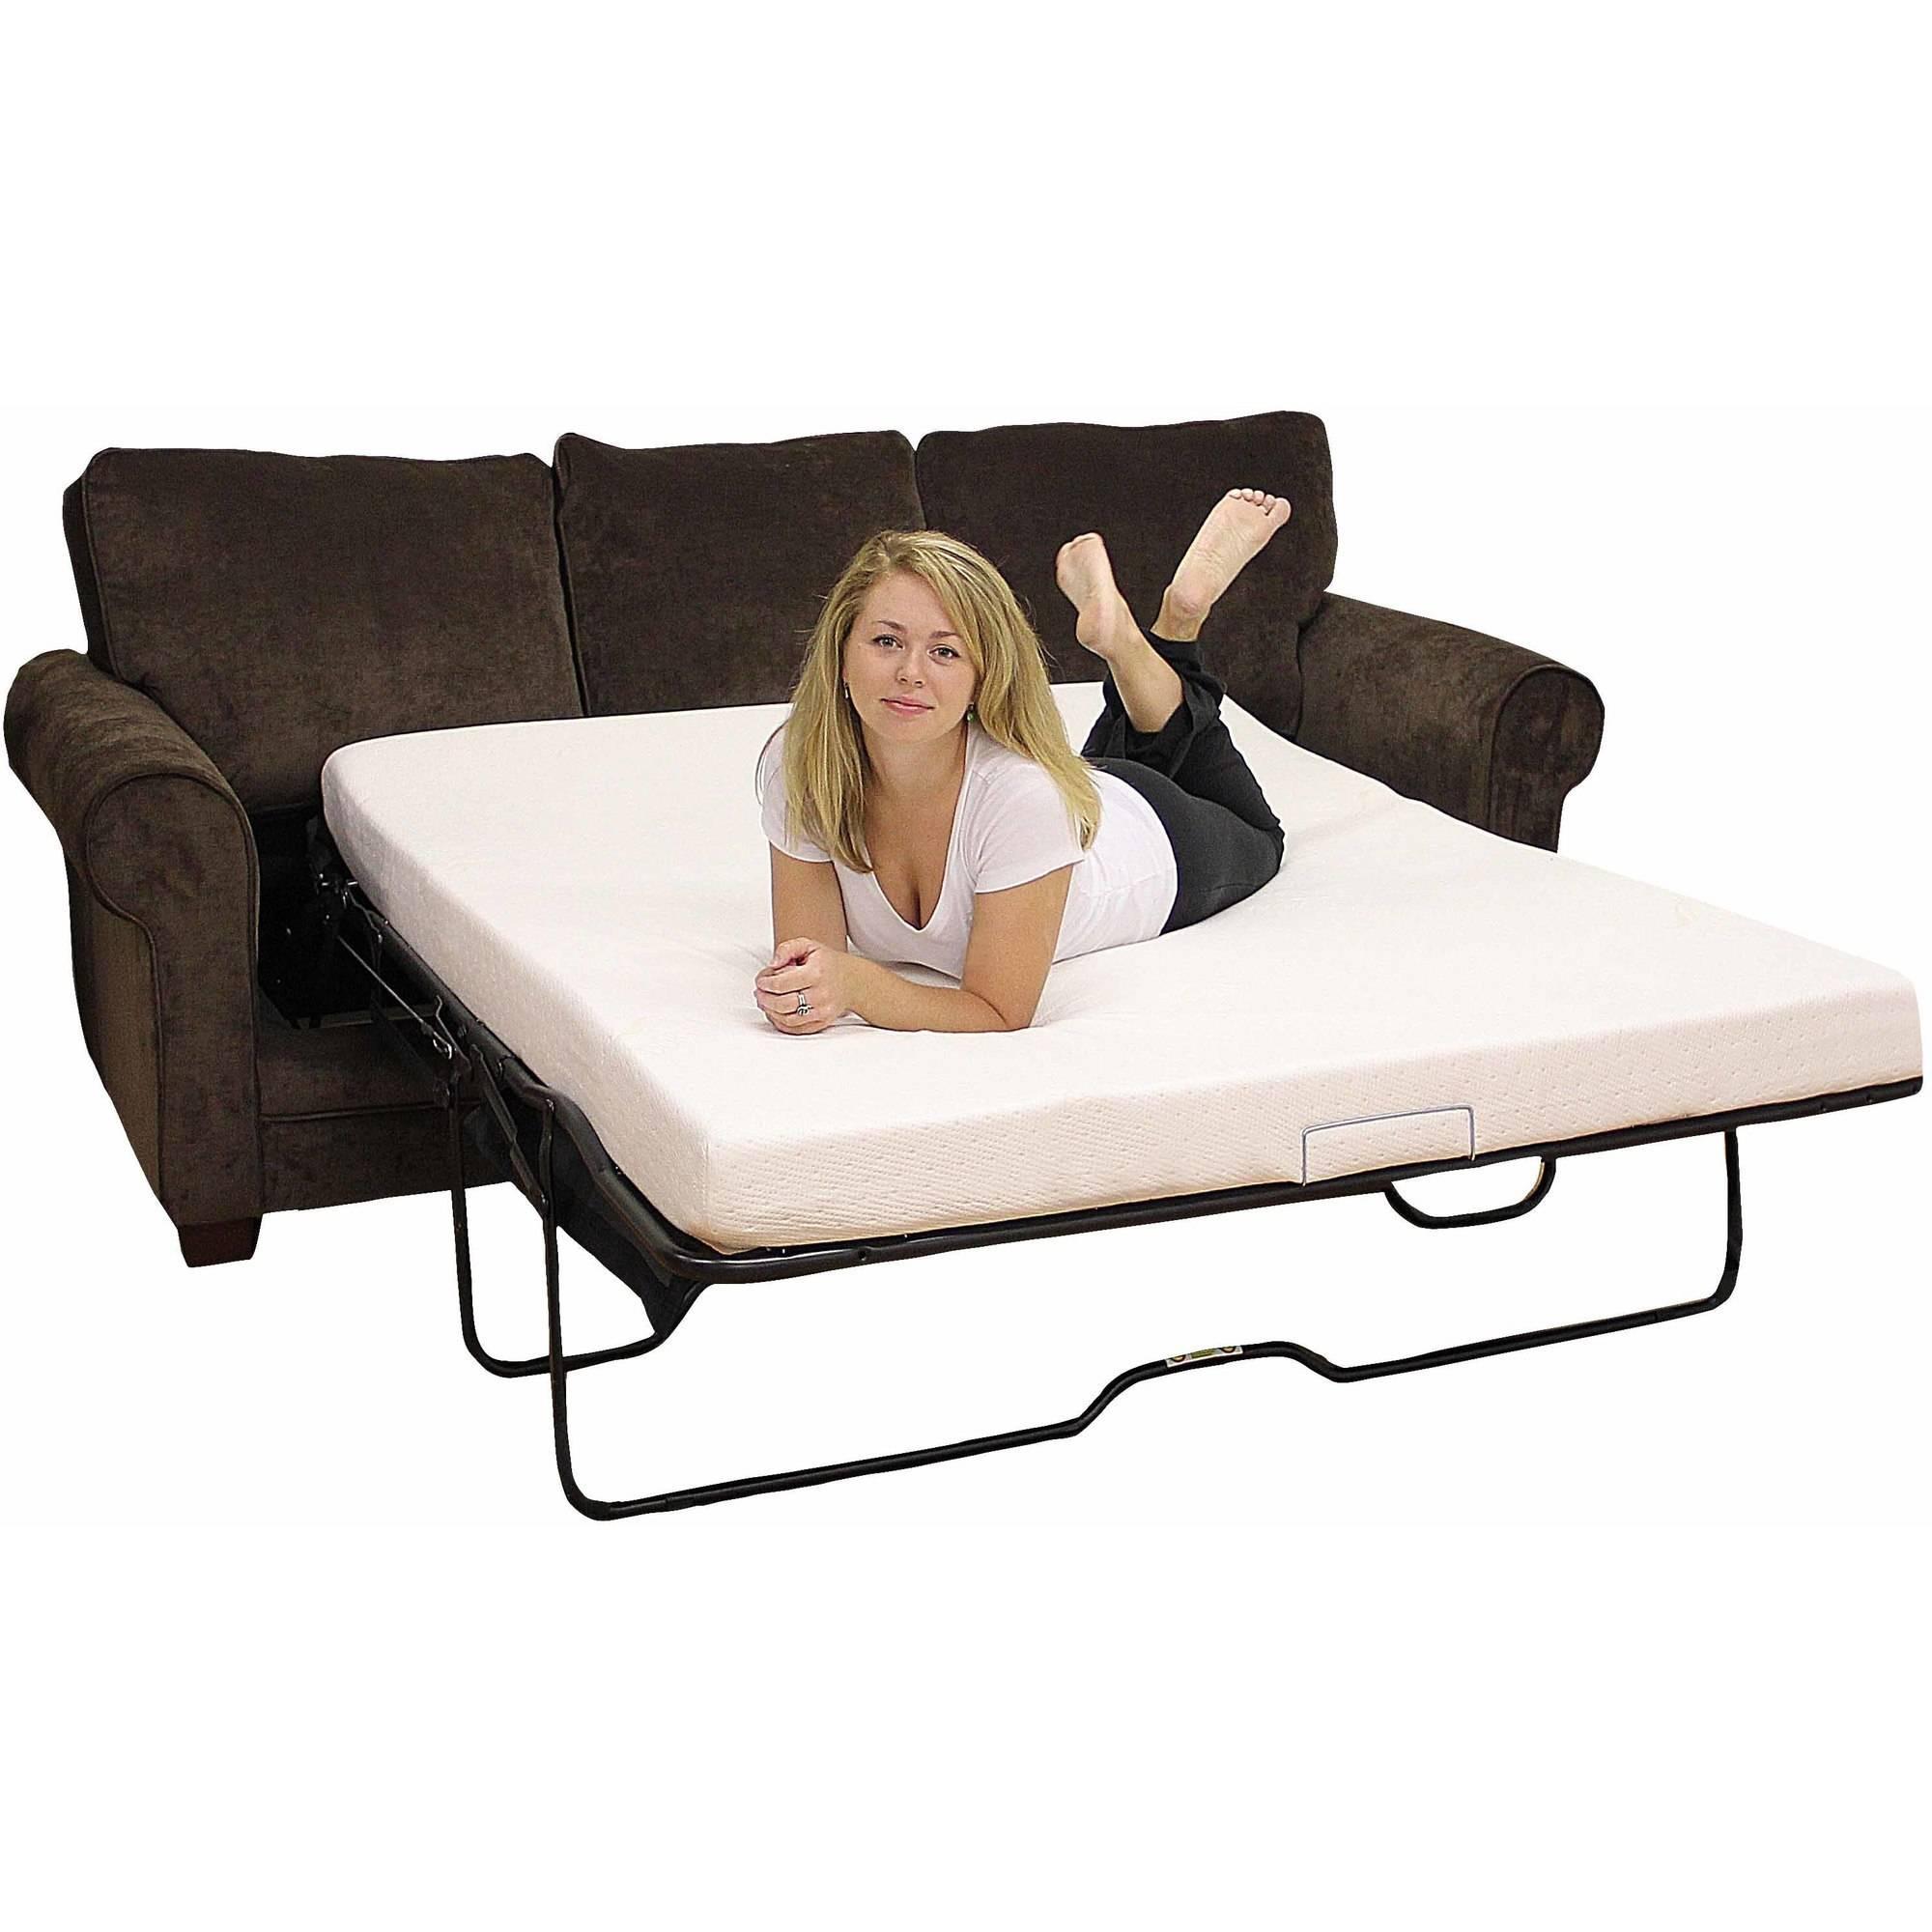 sofa bed mattress modern sleep memory foam 4.5 UAYRCFQ